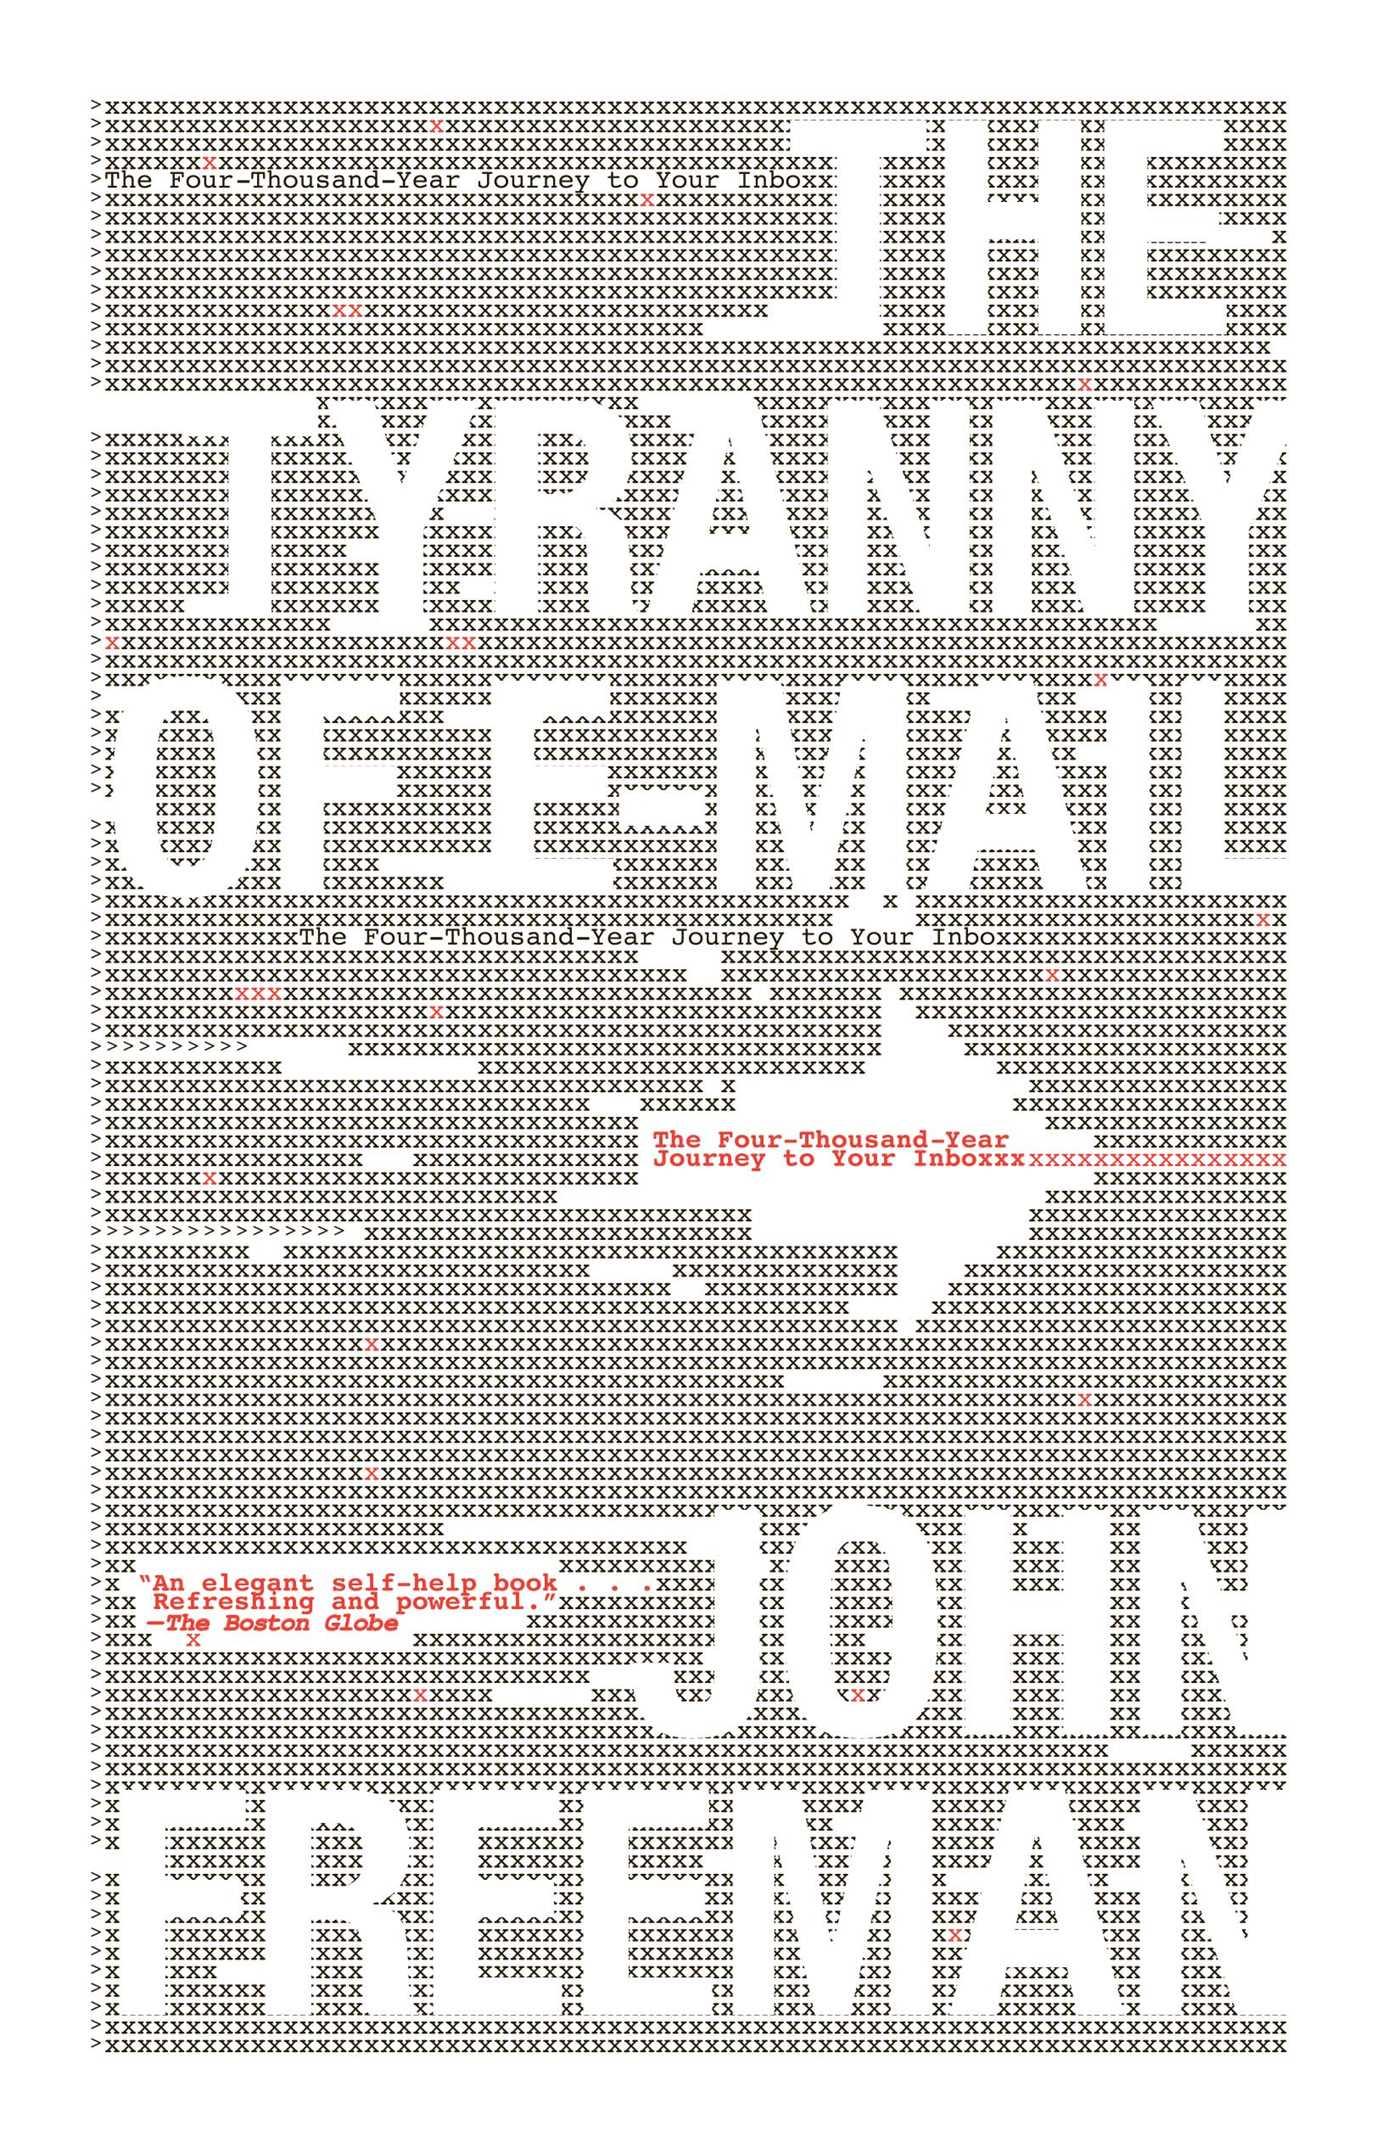 The tyranny of e mail 9781416576747 hr